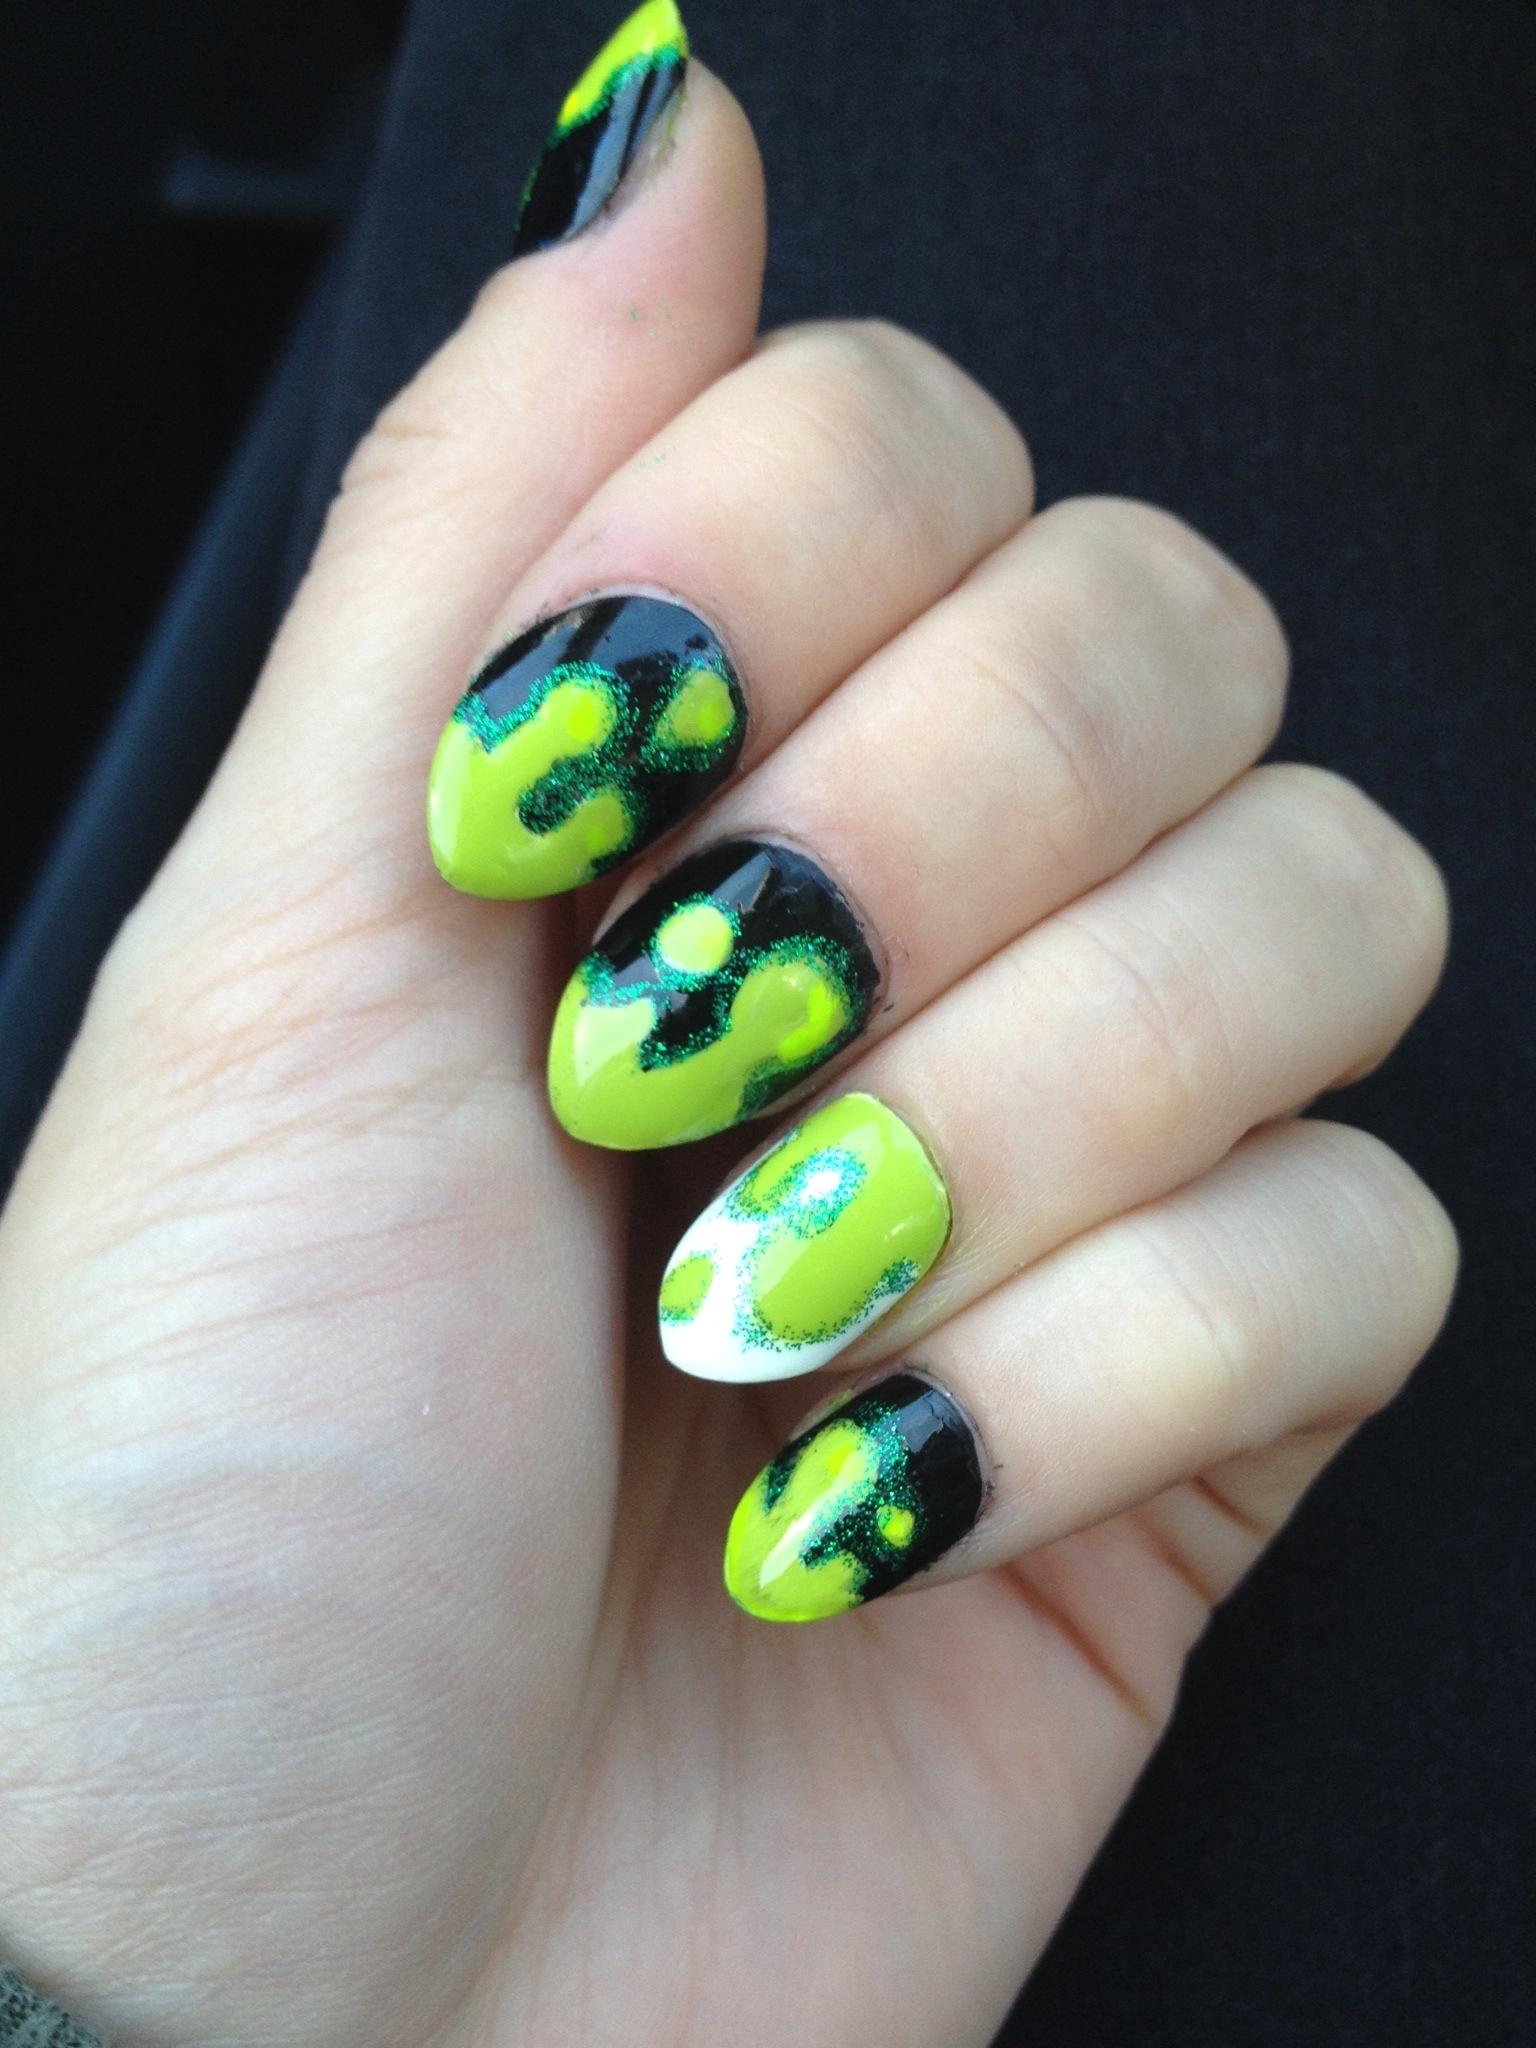 green slime Halloween nails